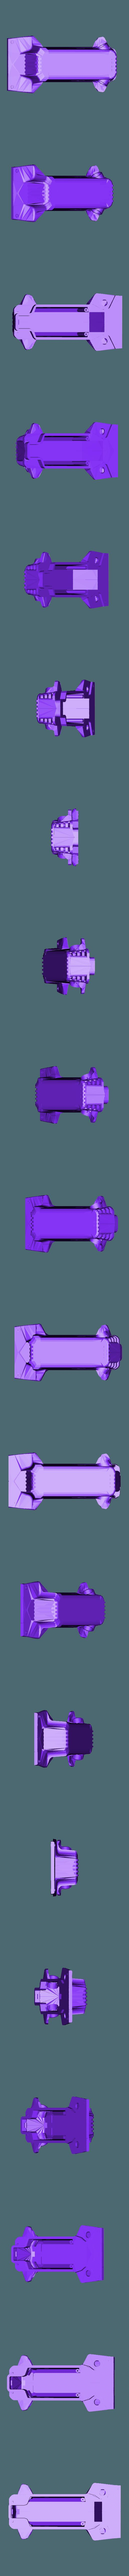 botom.stl Download free STL file Foldable drone frame (Mavic look like, body & head alternative) Remix • 3D printer model, mwilmars